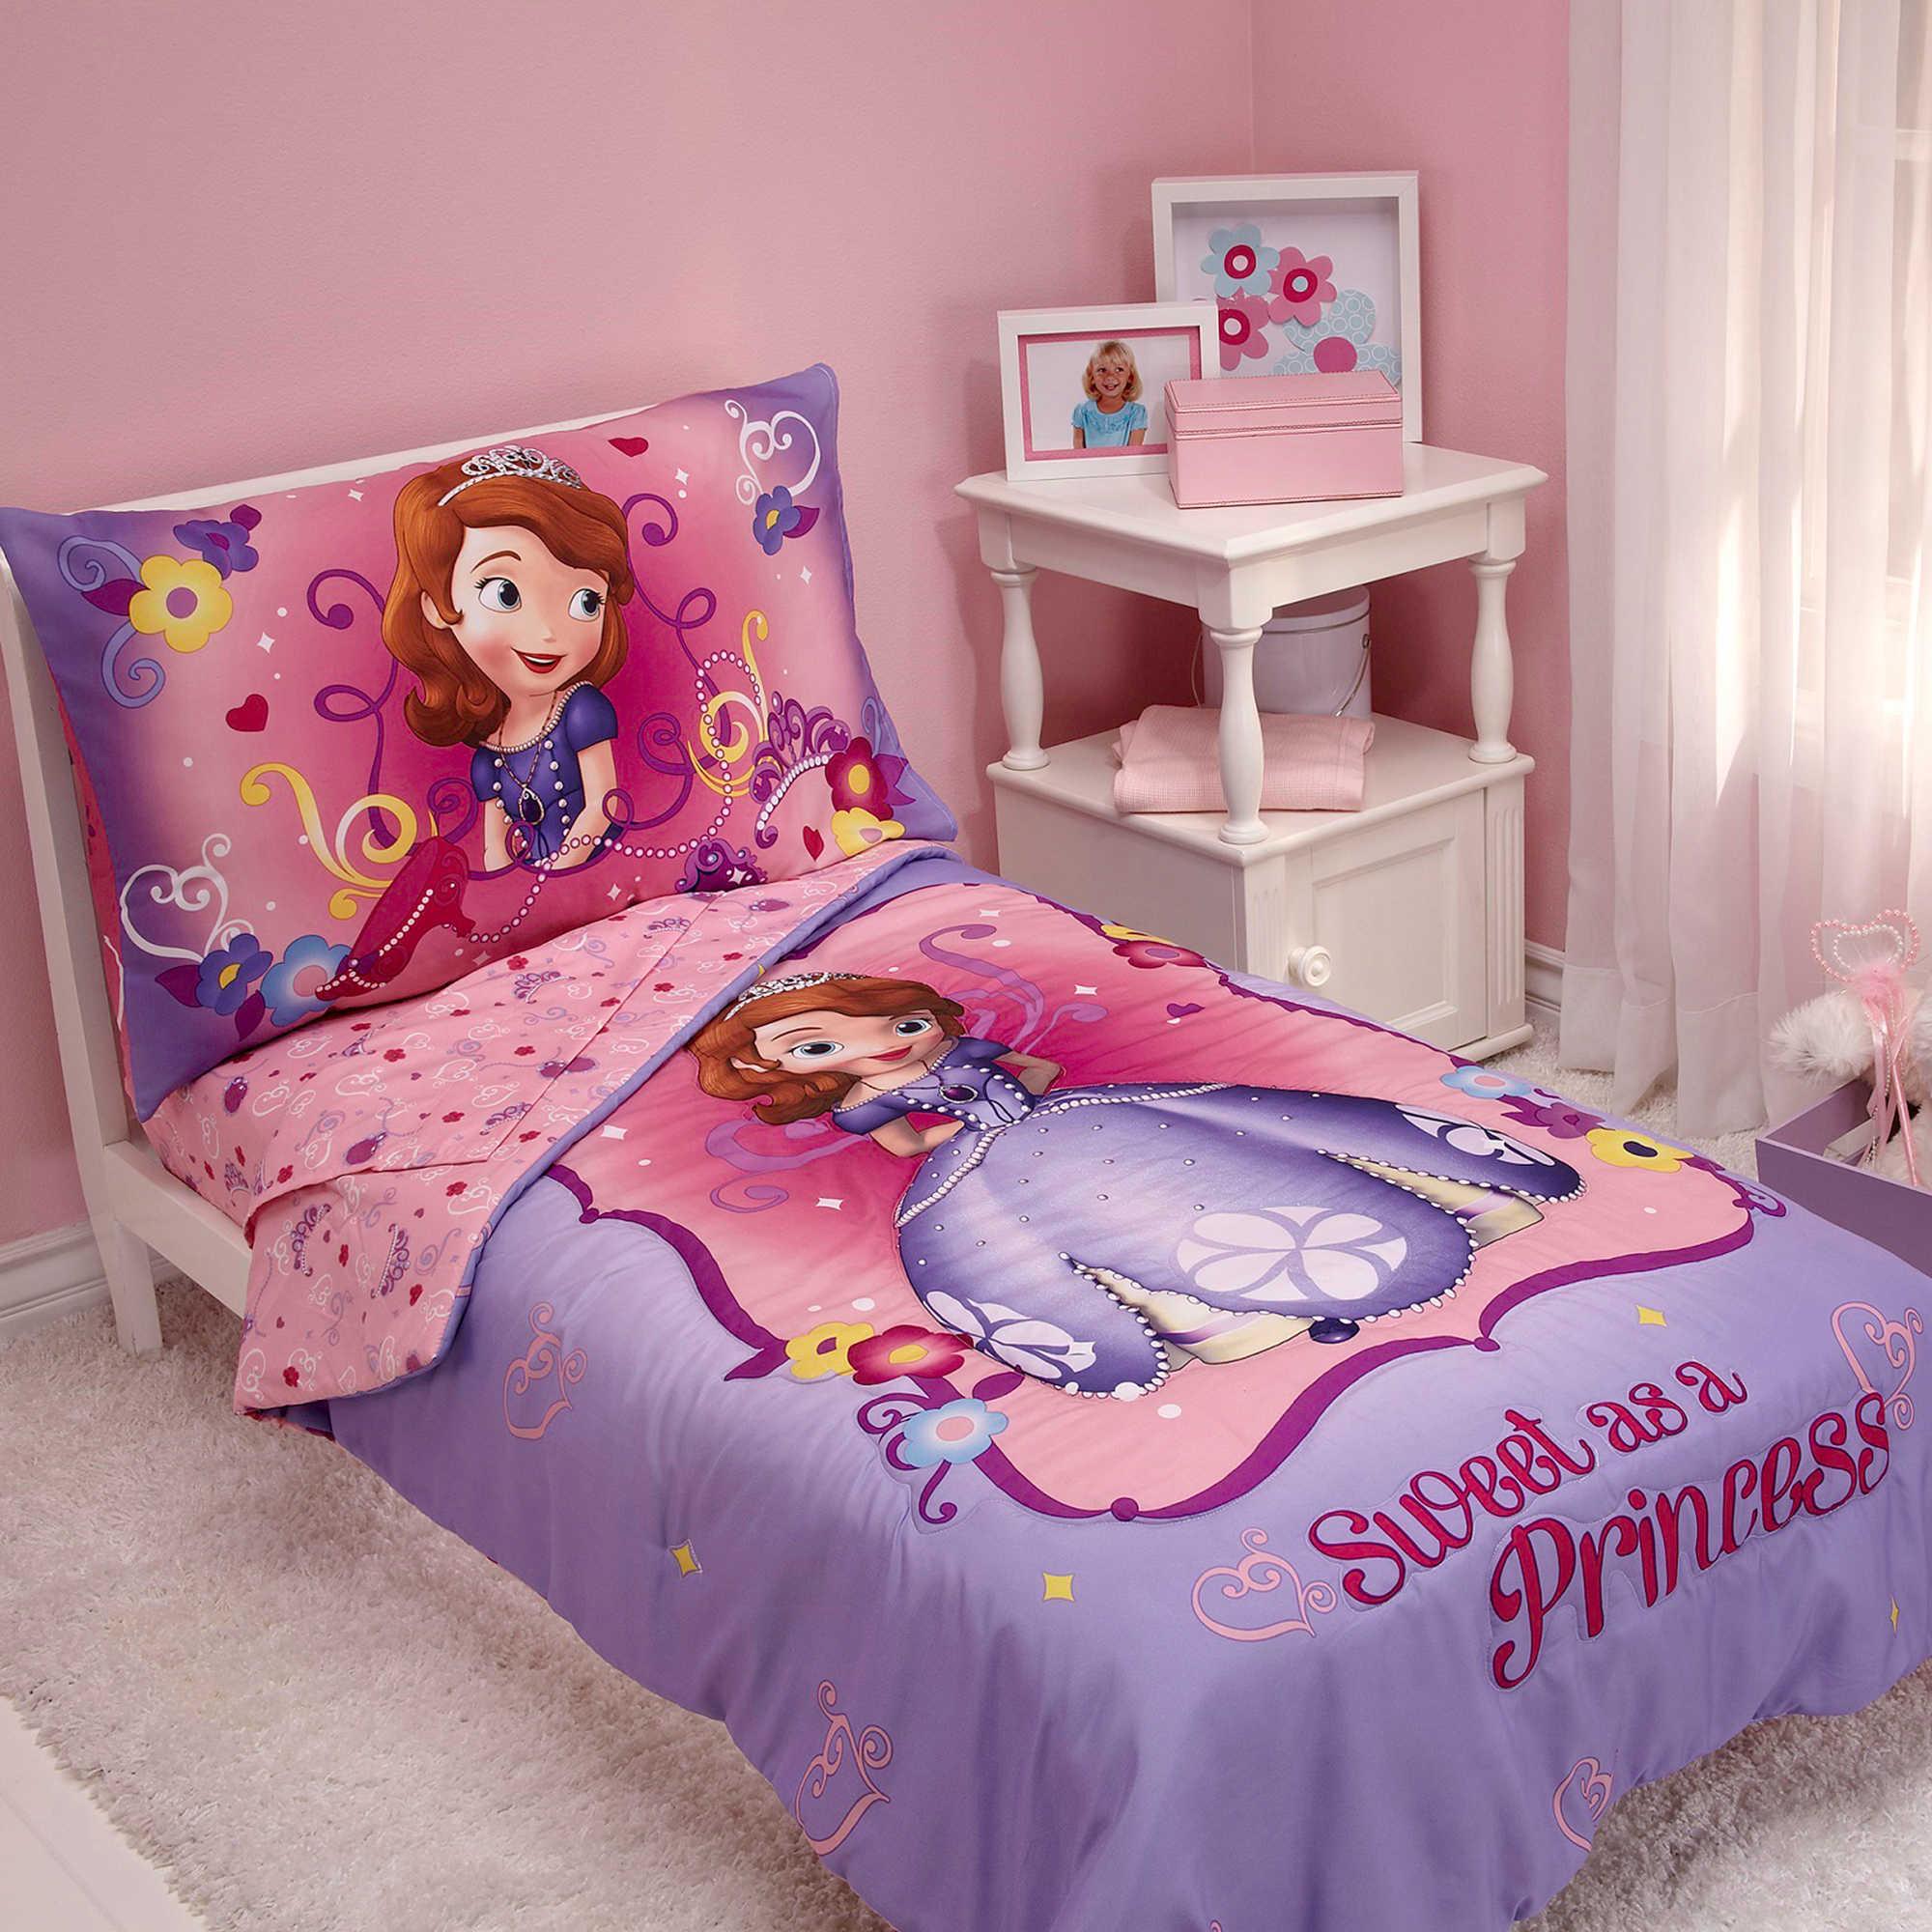 Fun Bed Sheets Ideas